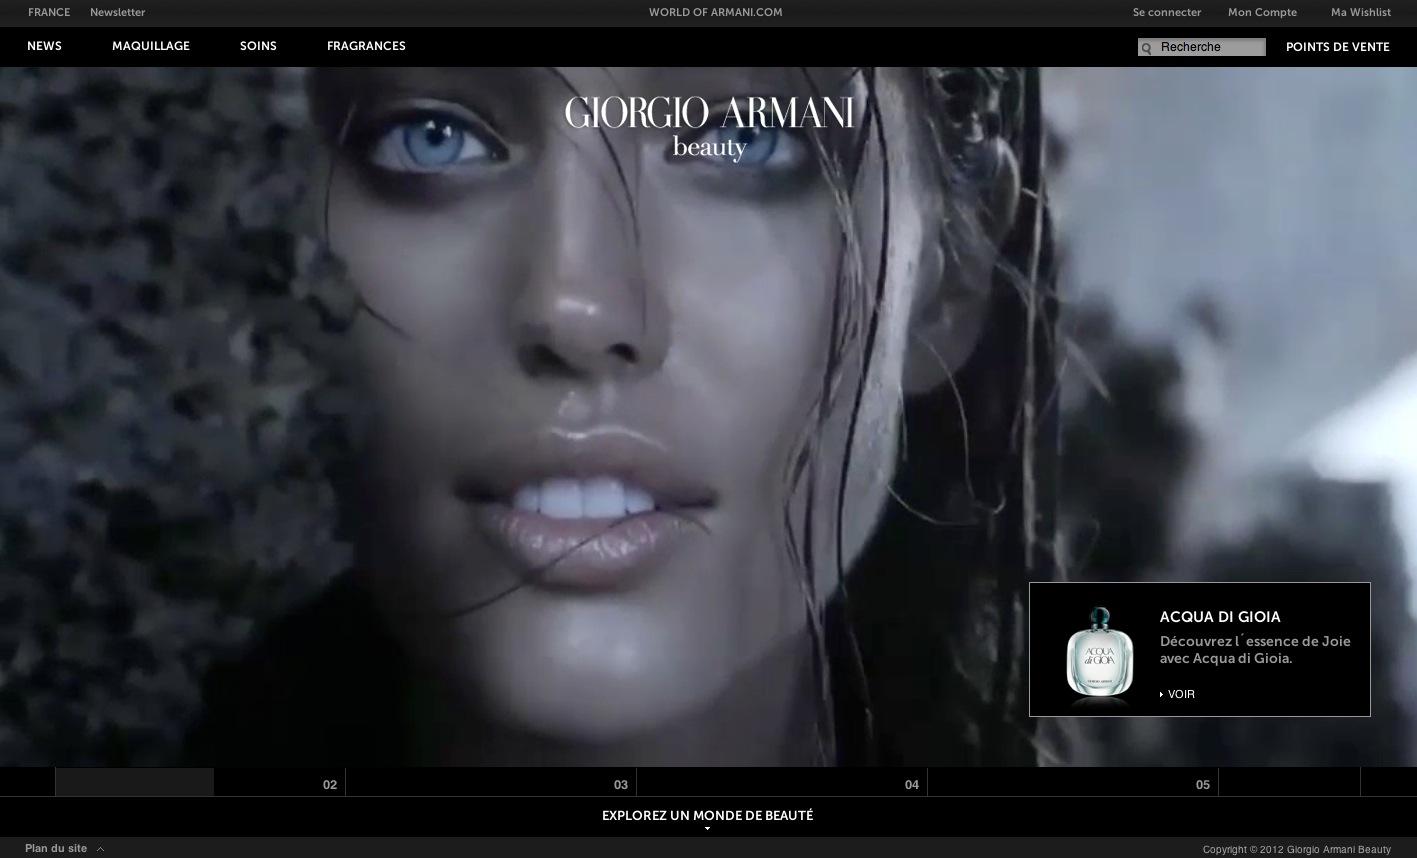 llllitl-armani-giorgio-armani-beauty-fragrance-site-web-website-plateforme-de-marque-parfum-essenza-made-by-digitas-juin-2012